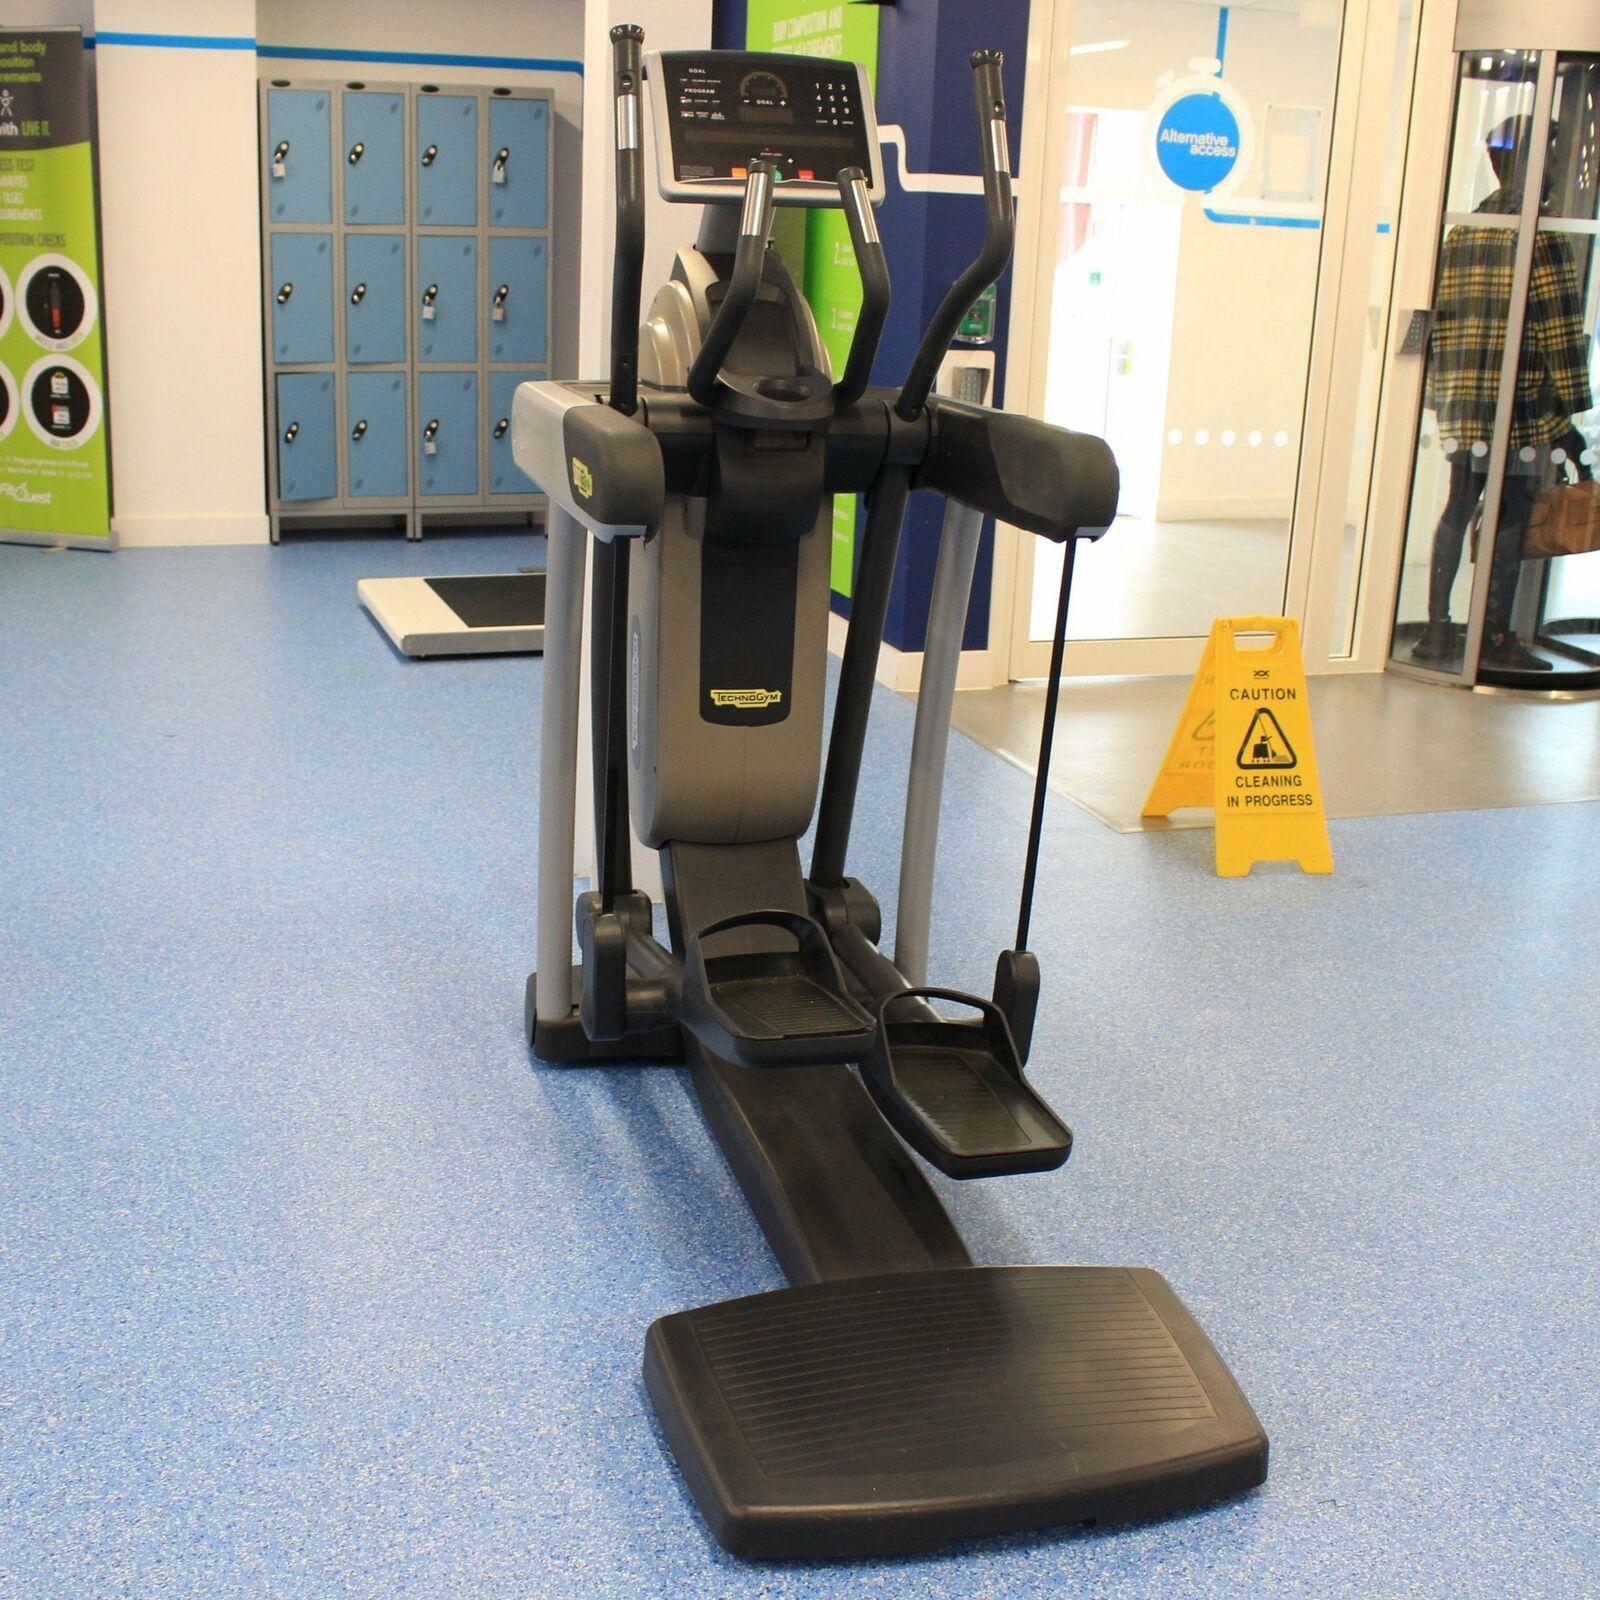 Technogym Excite+ 700i SP LED Vario Cross Trainer - Commercial Gym Equipment